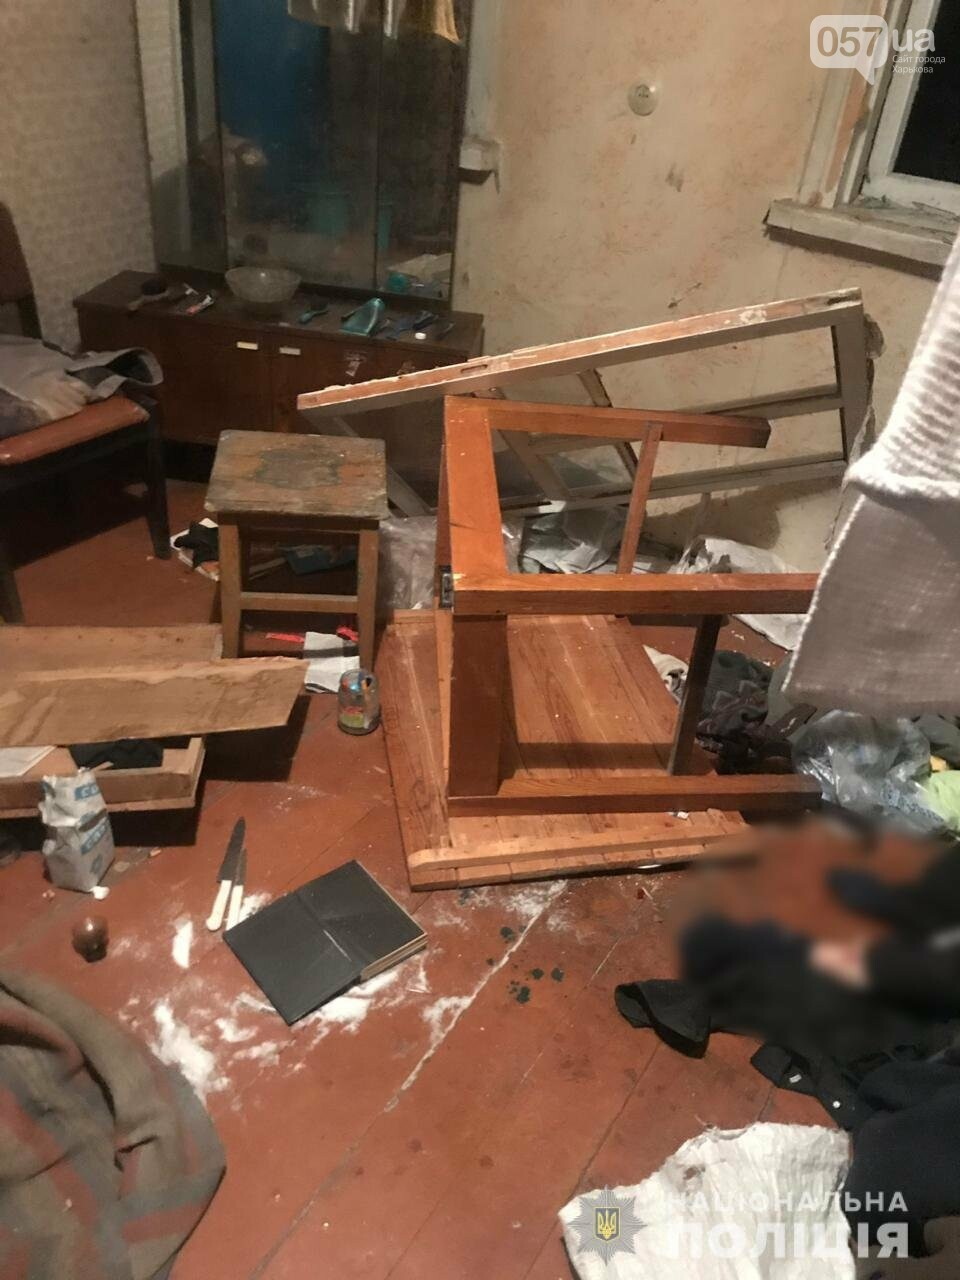 На Харьковщине арестовали мужчину, которого подозревают в убийстве знакомого, - ФОТО, фото-1